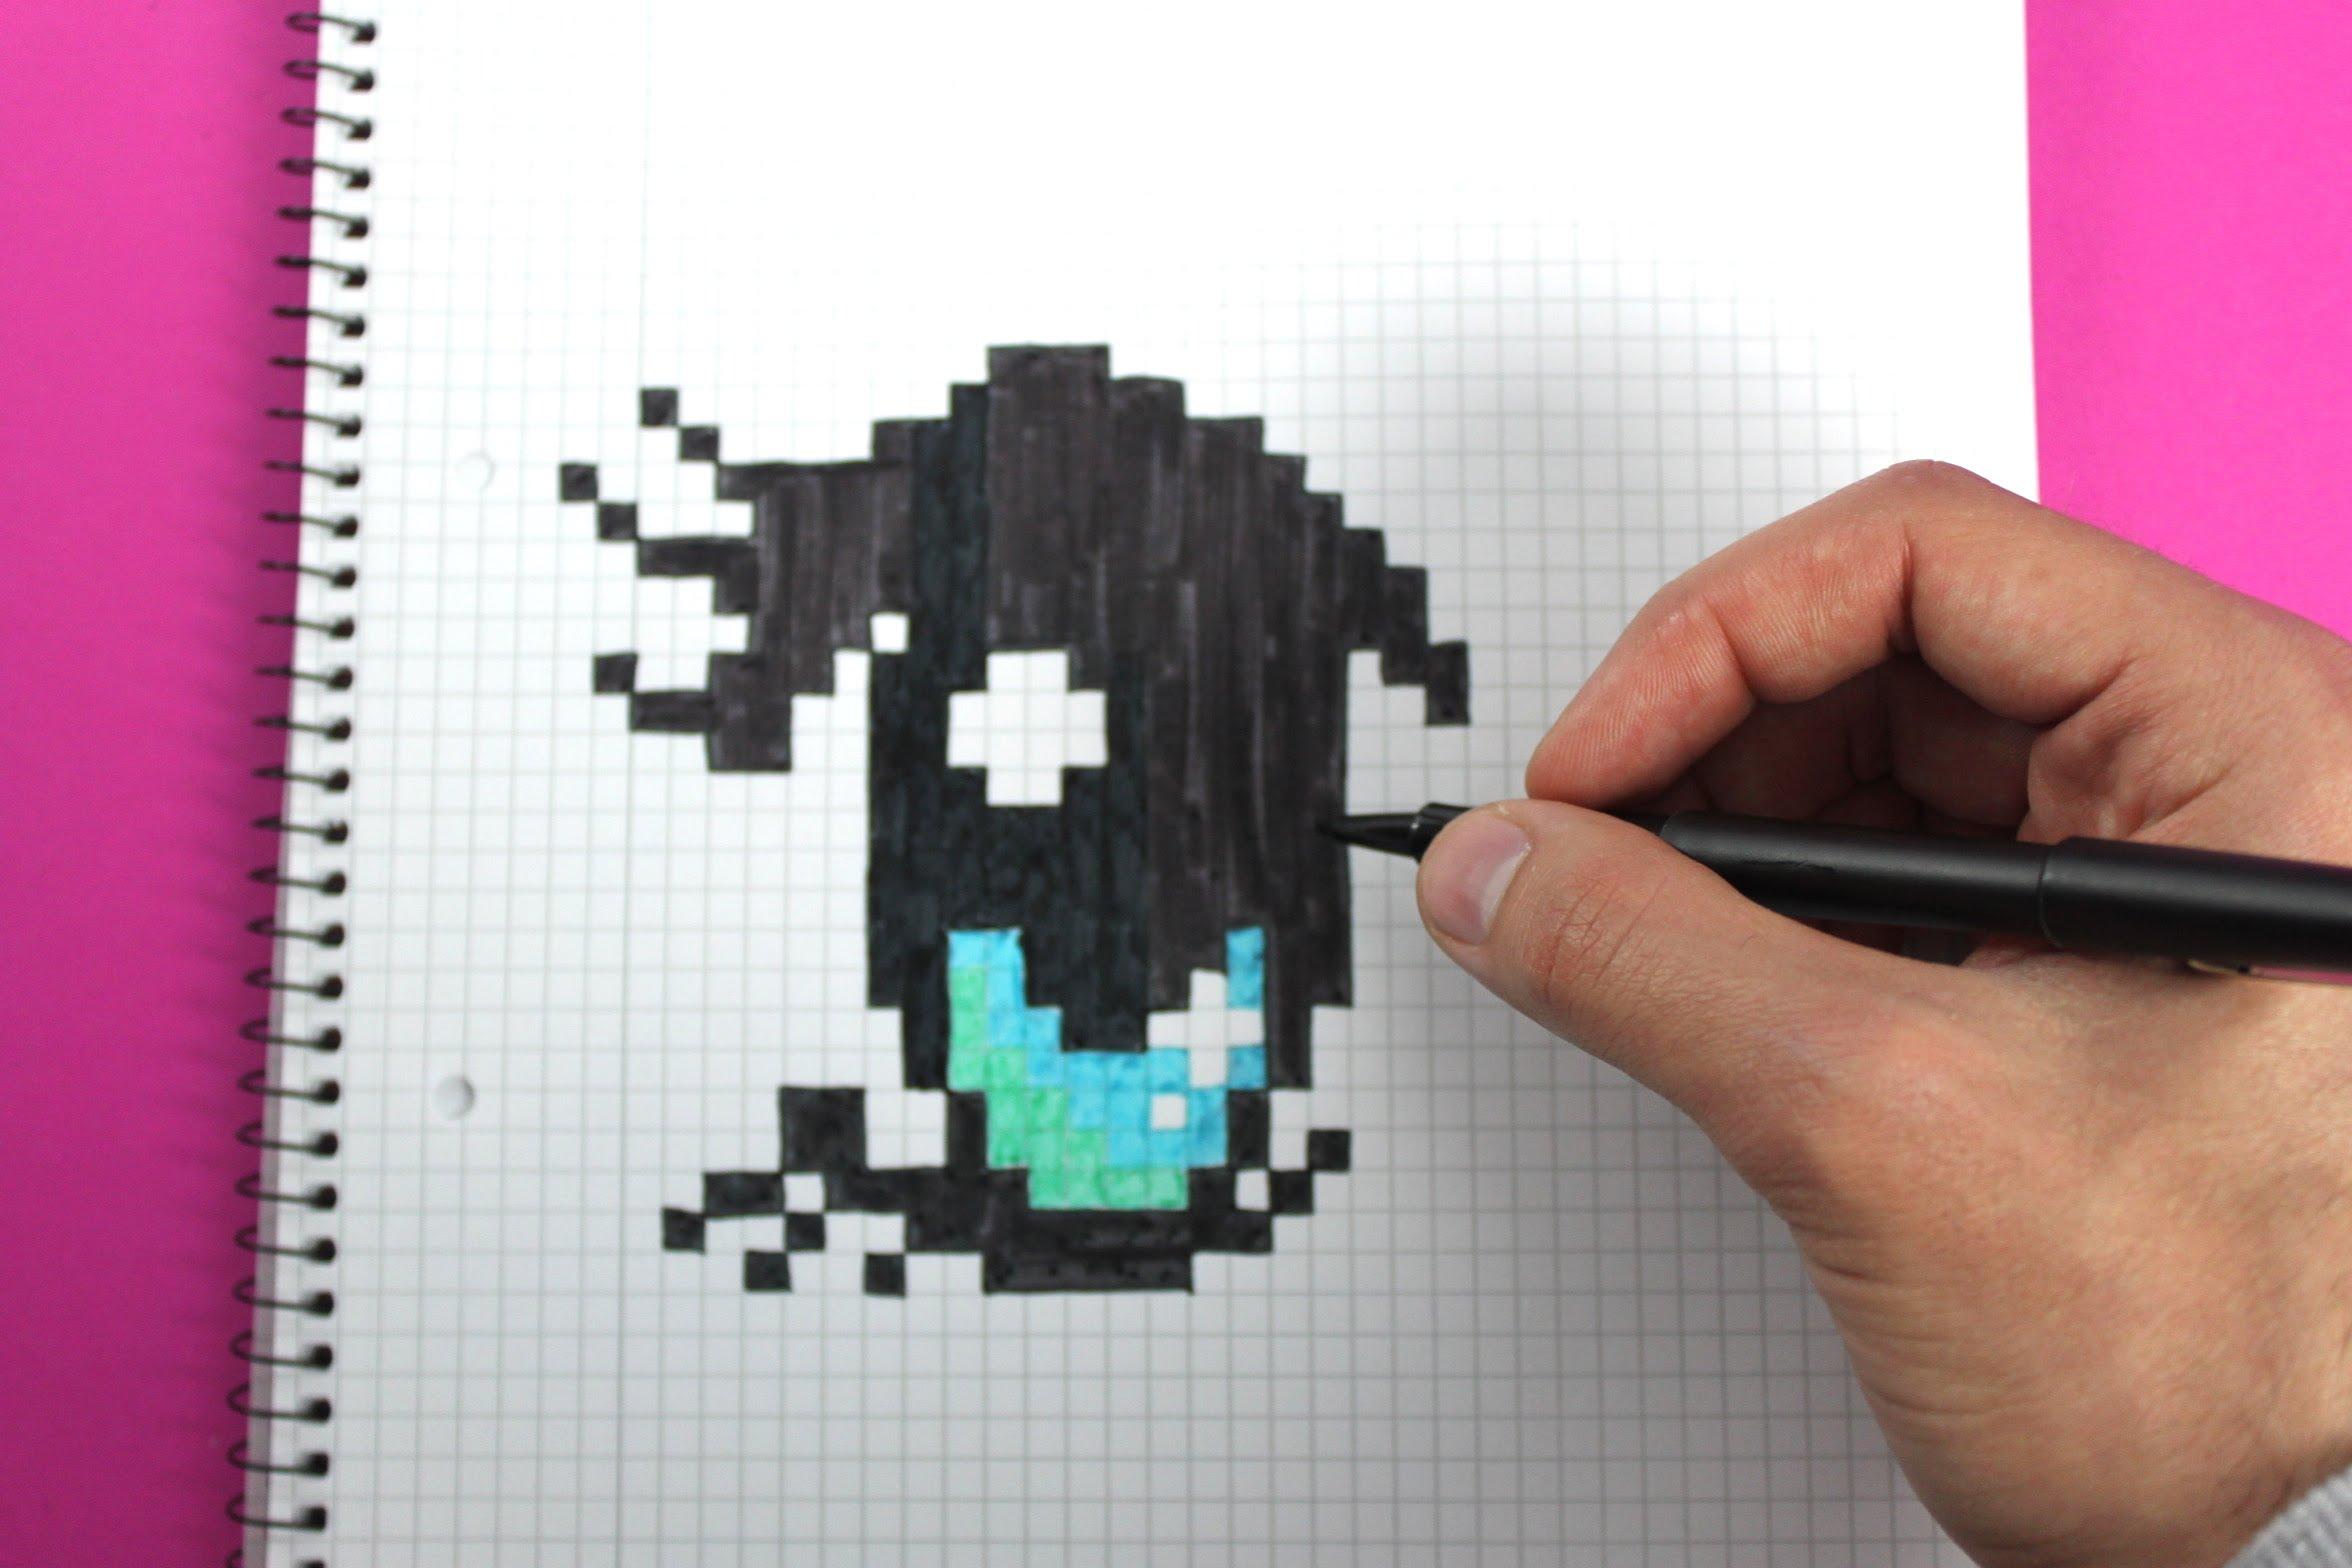 Drawn pixel art pixel eye Art draw a to Handmade